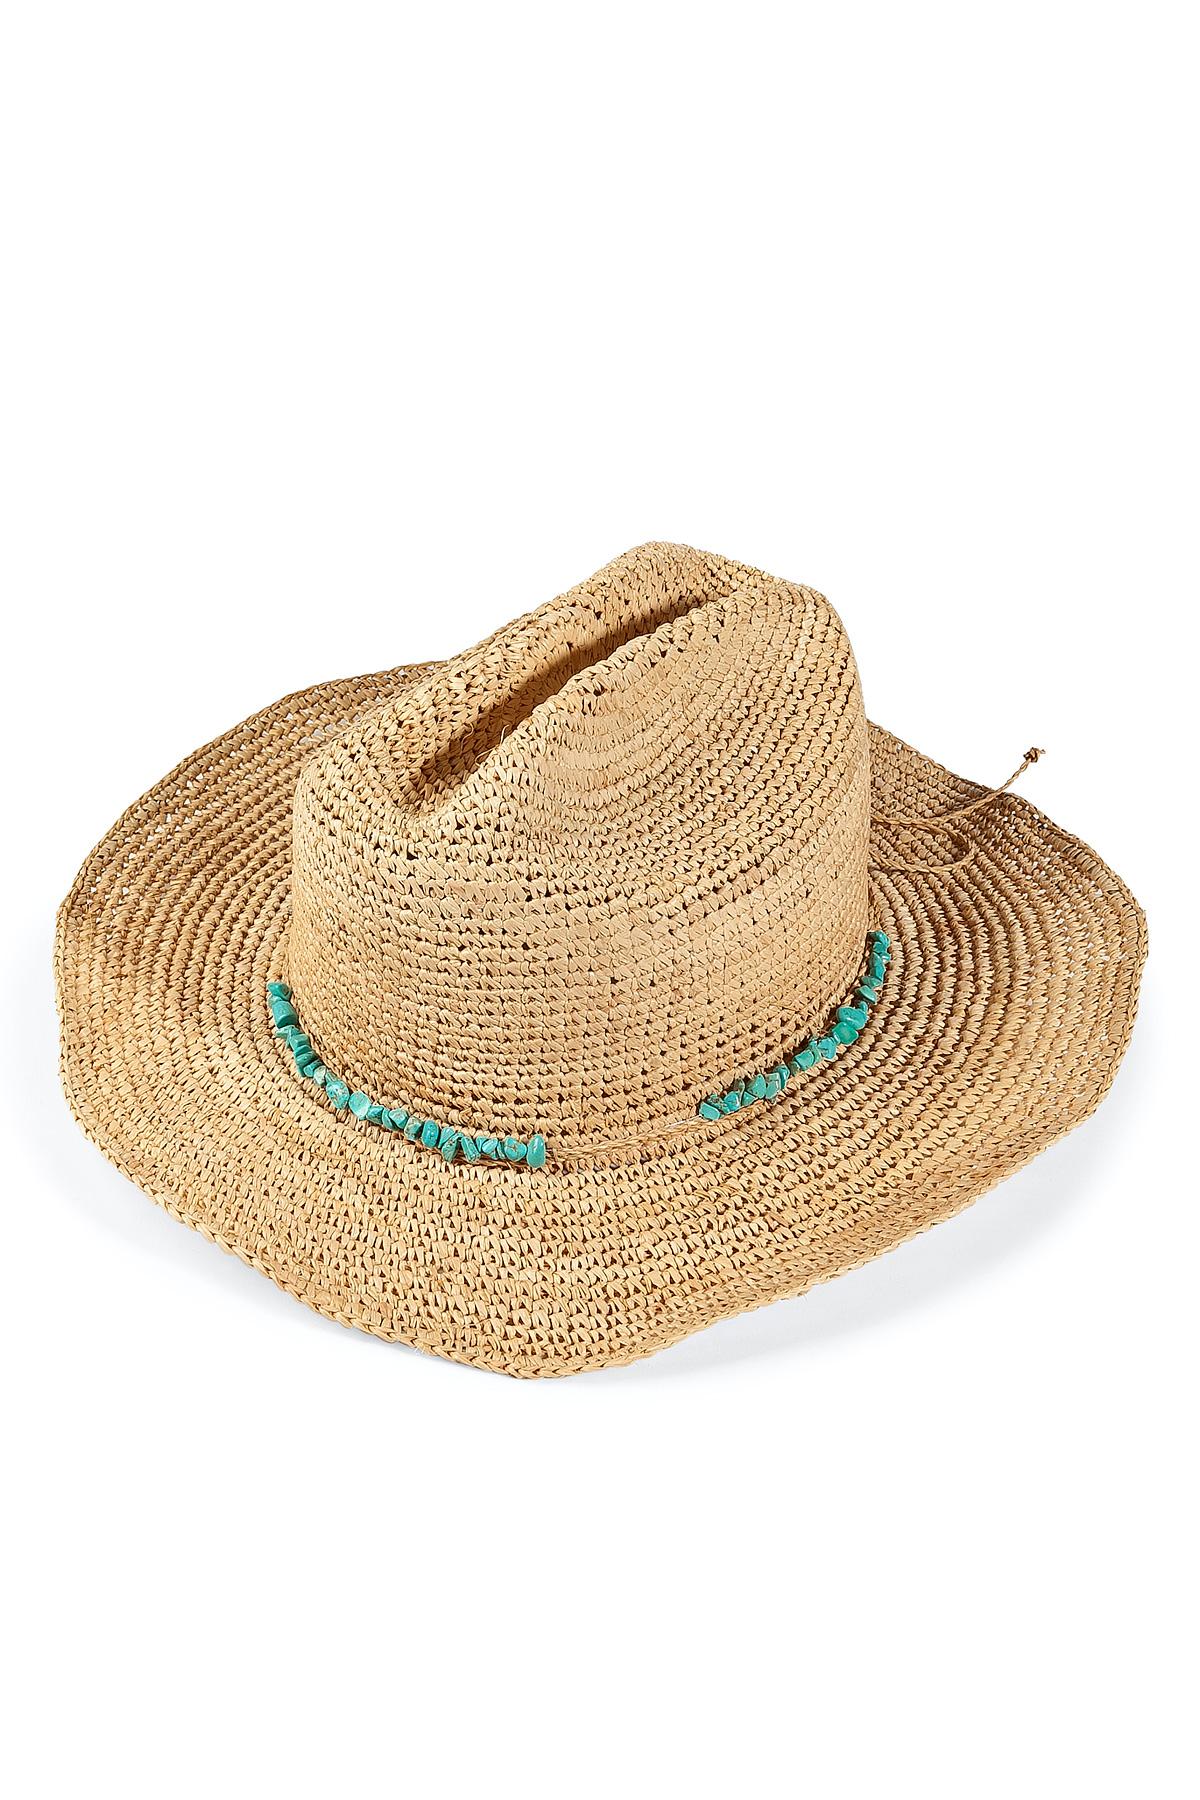 Melissa Odabash Elle Cowboy Hat in Blue - Lyst f7f5241ca949